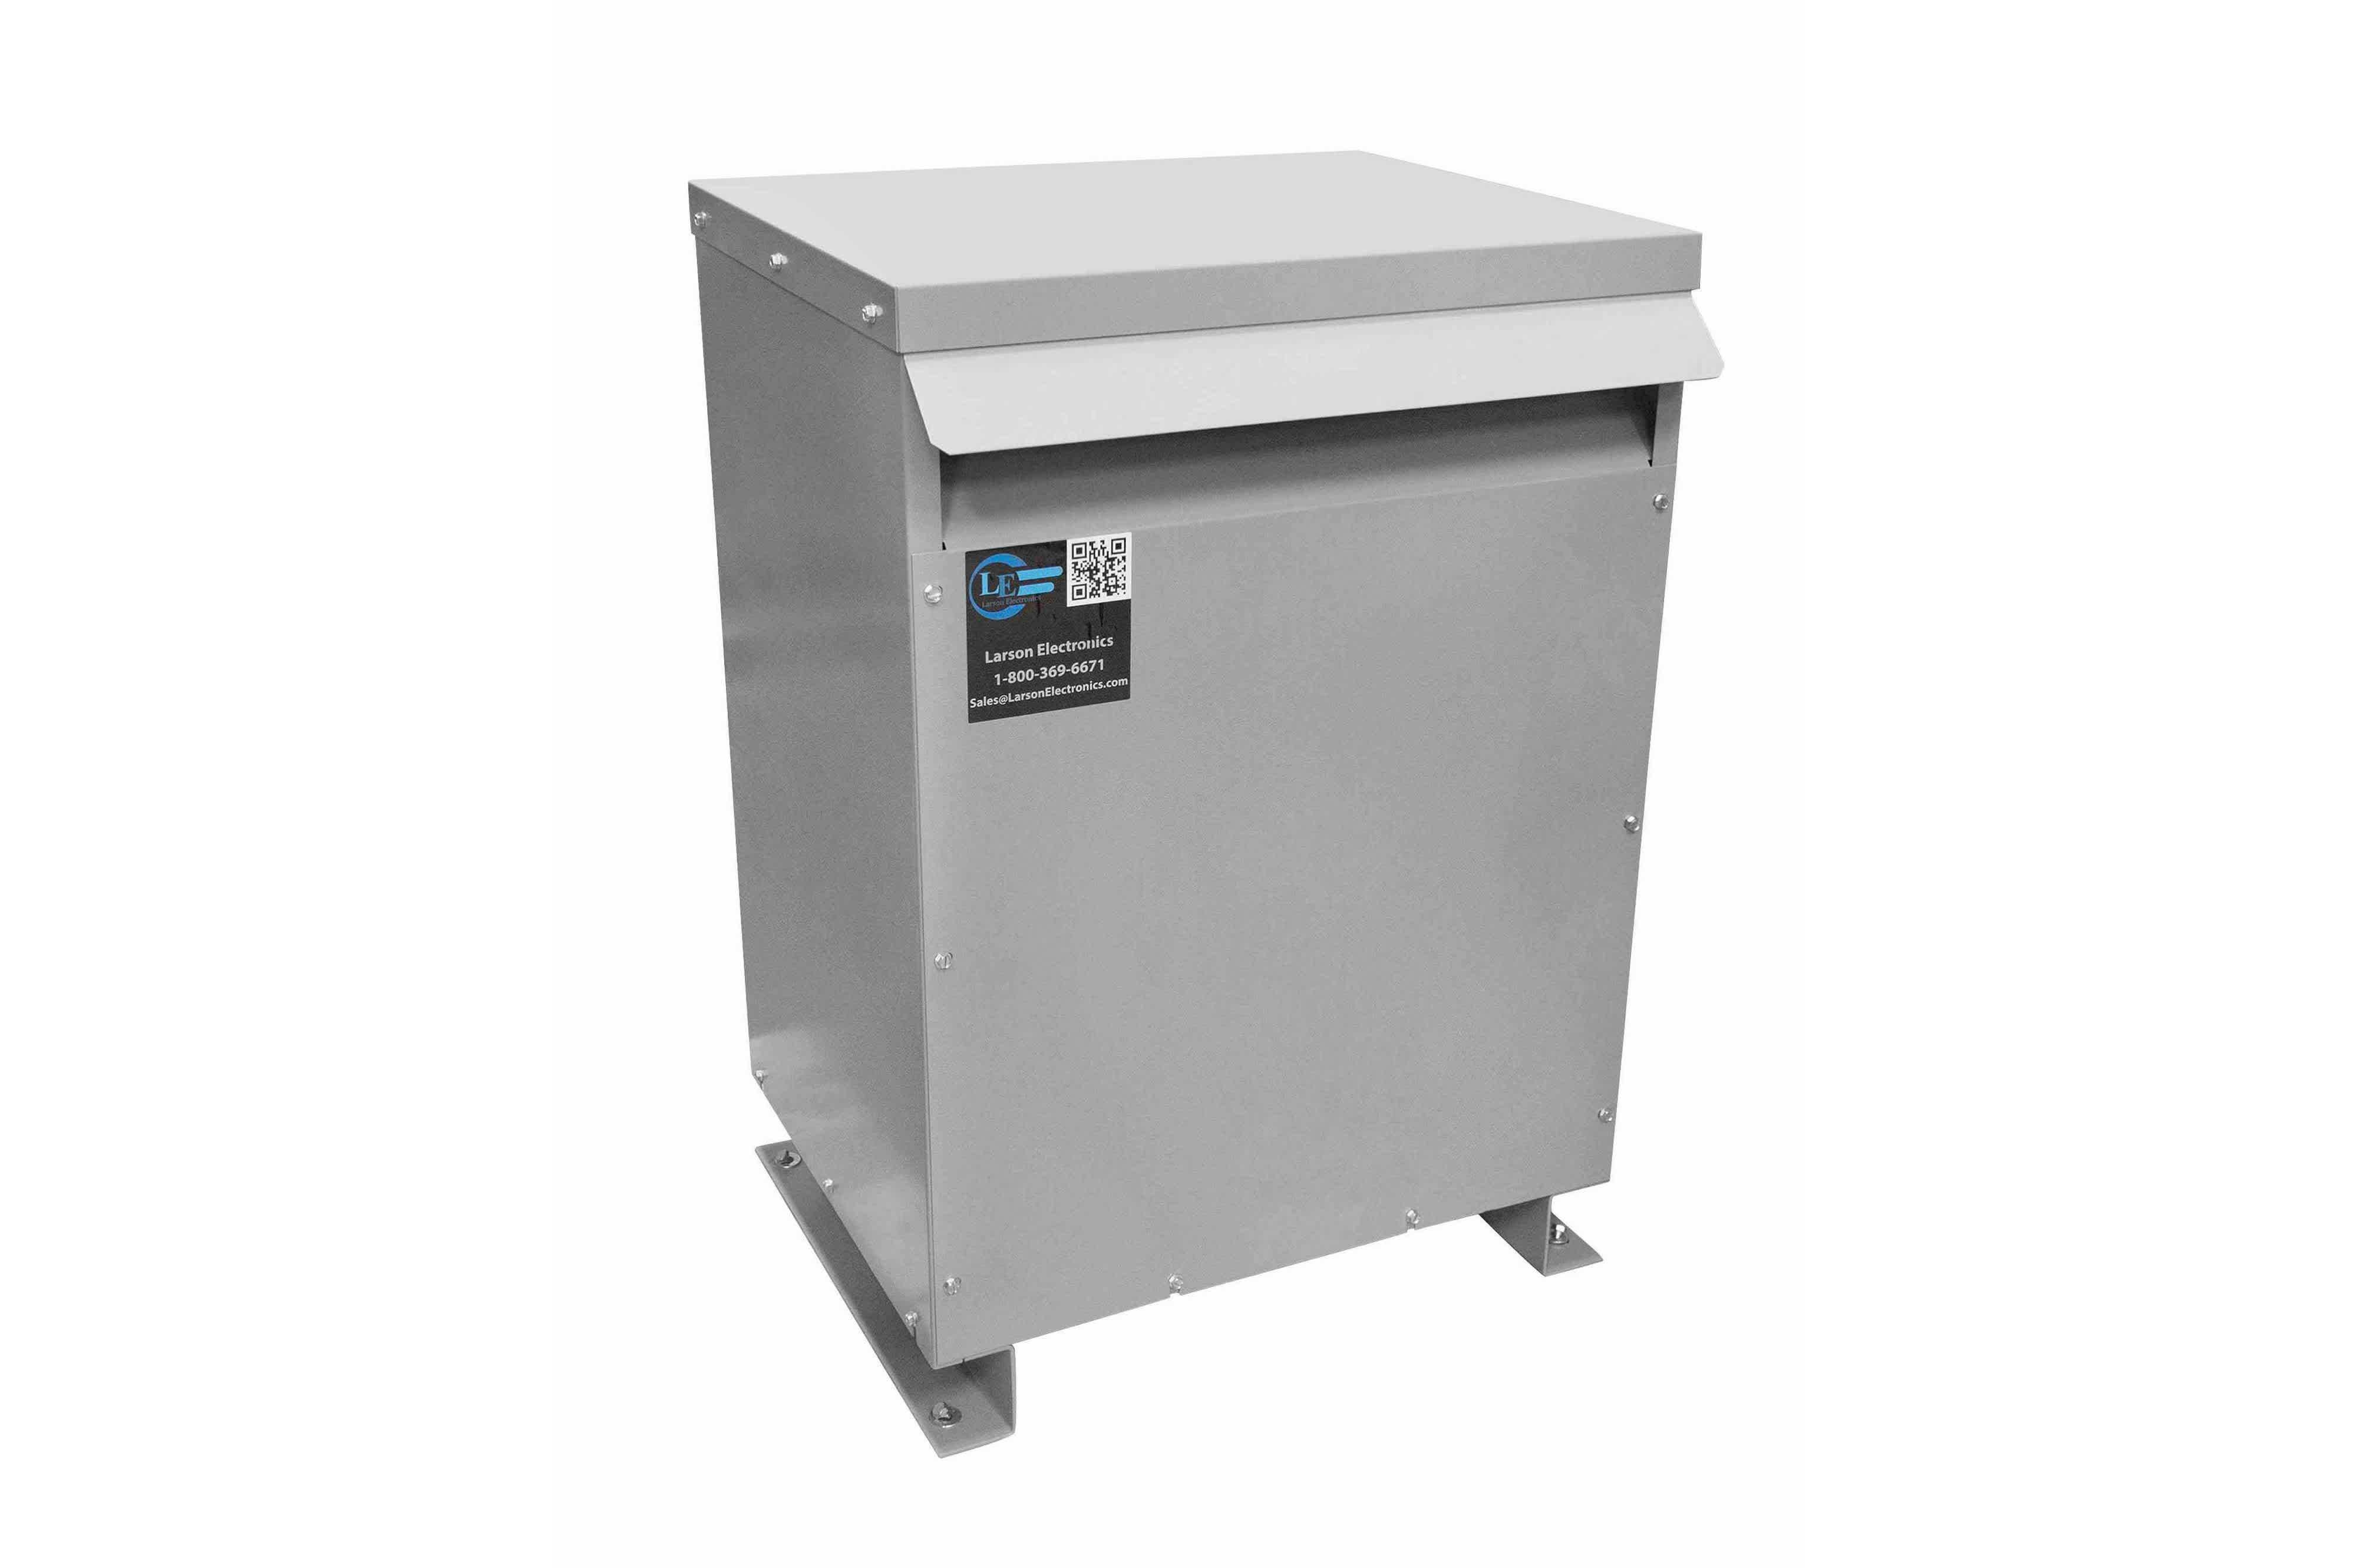 15 kVA 3PH Isolation Transformer, 240V Wye Primary, 208Y/120 Wye-N Secondary, N3R, Ventilated, 60 Hz